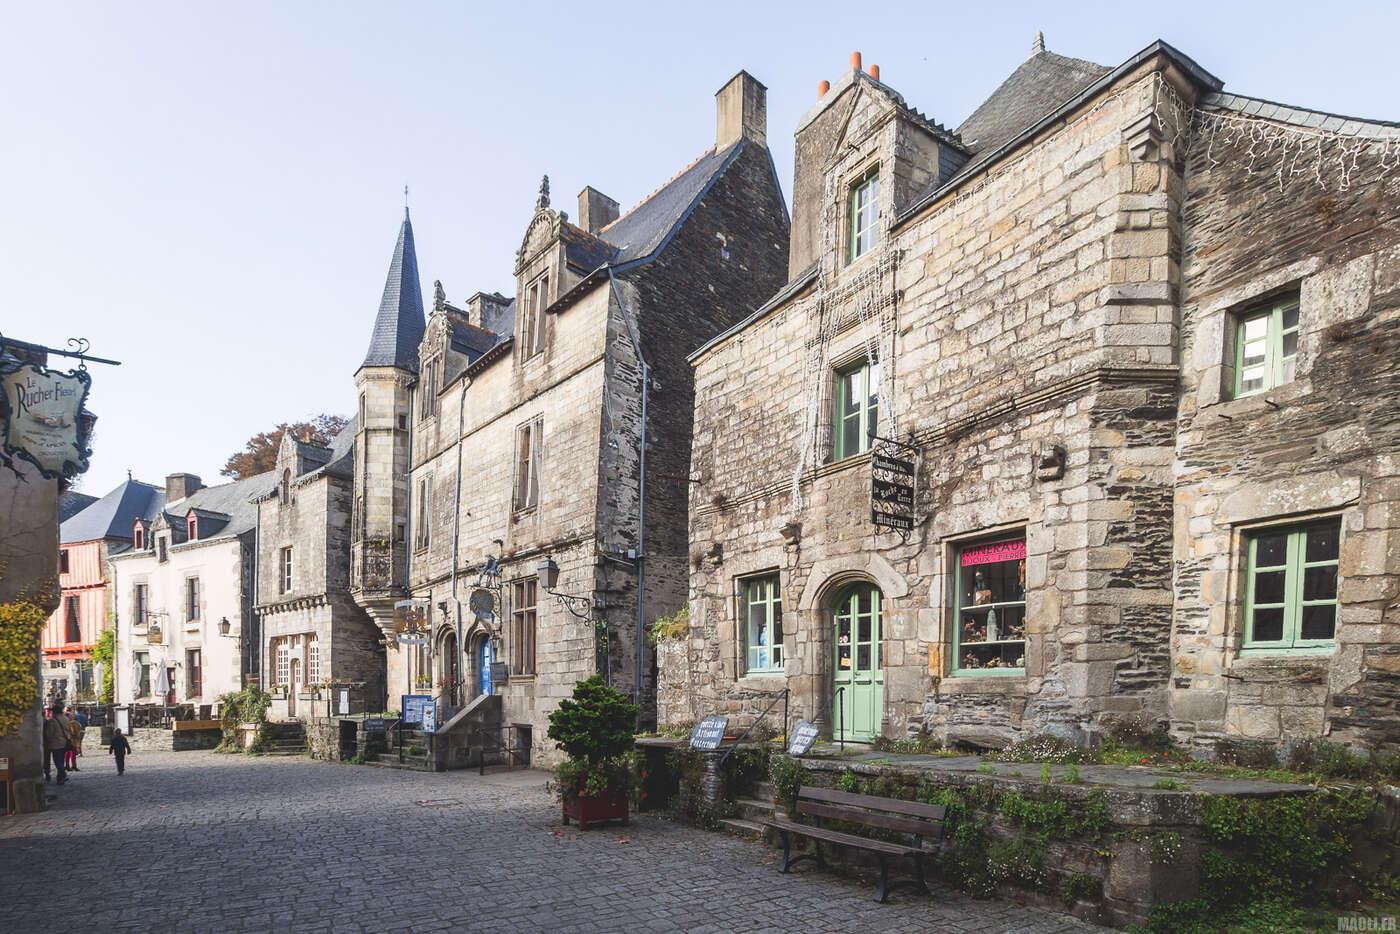 Rue des Scourtets, Rochefort-en-Terre